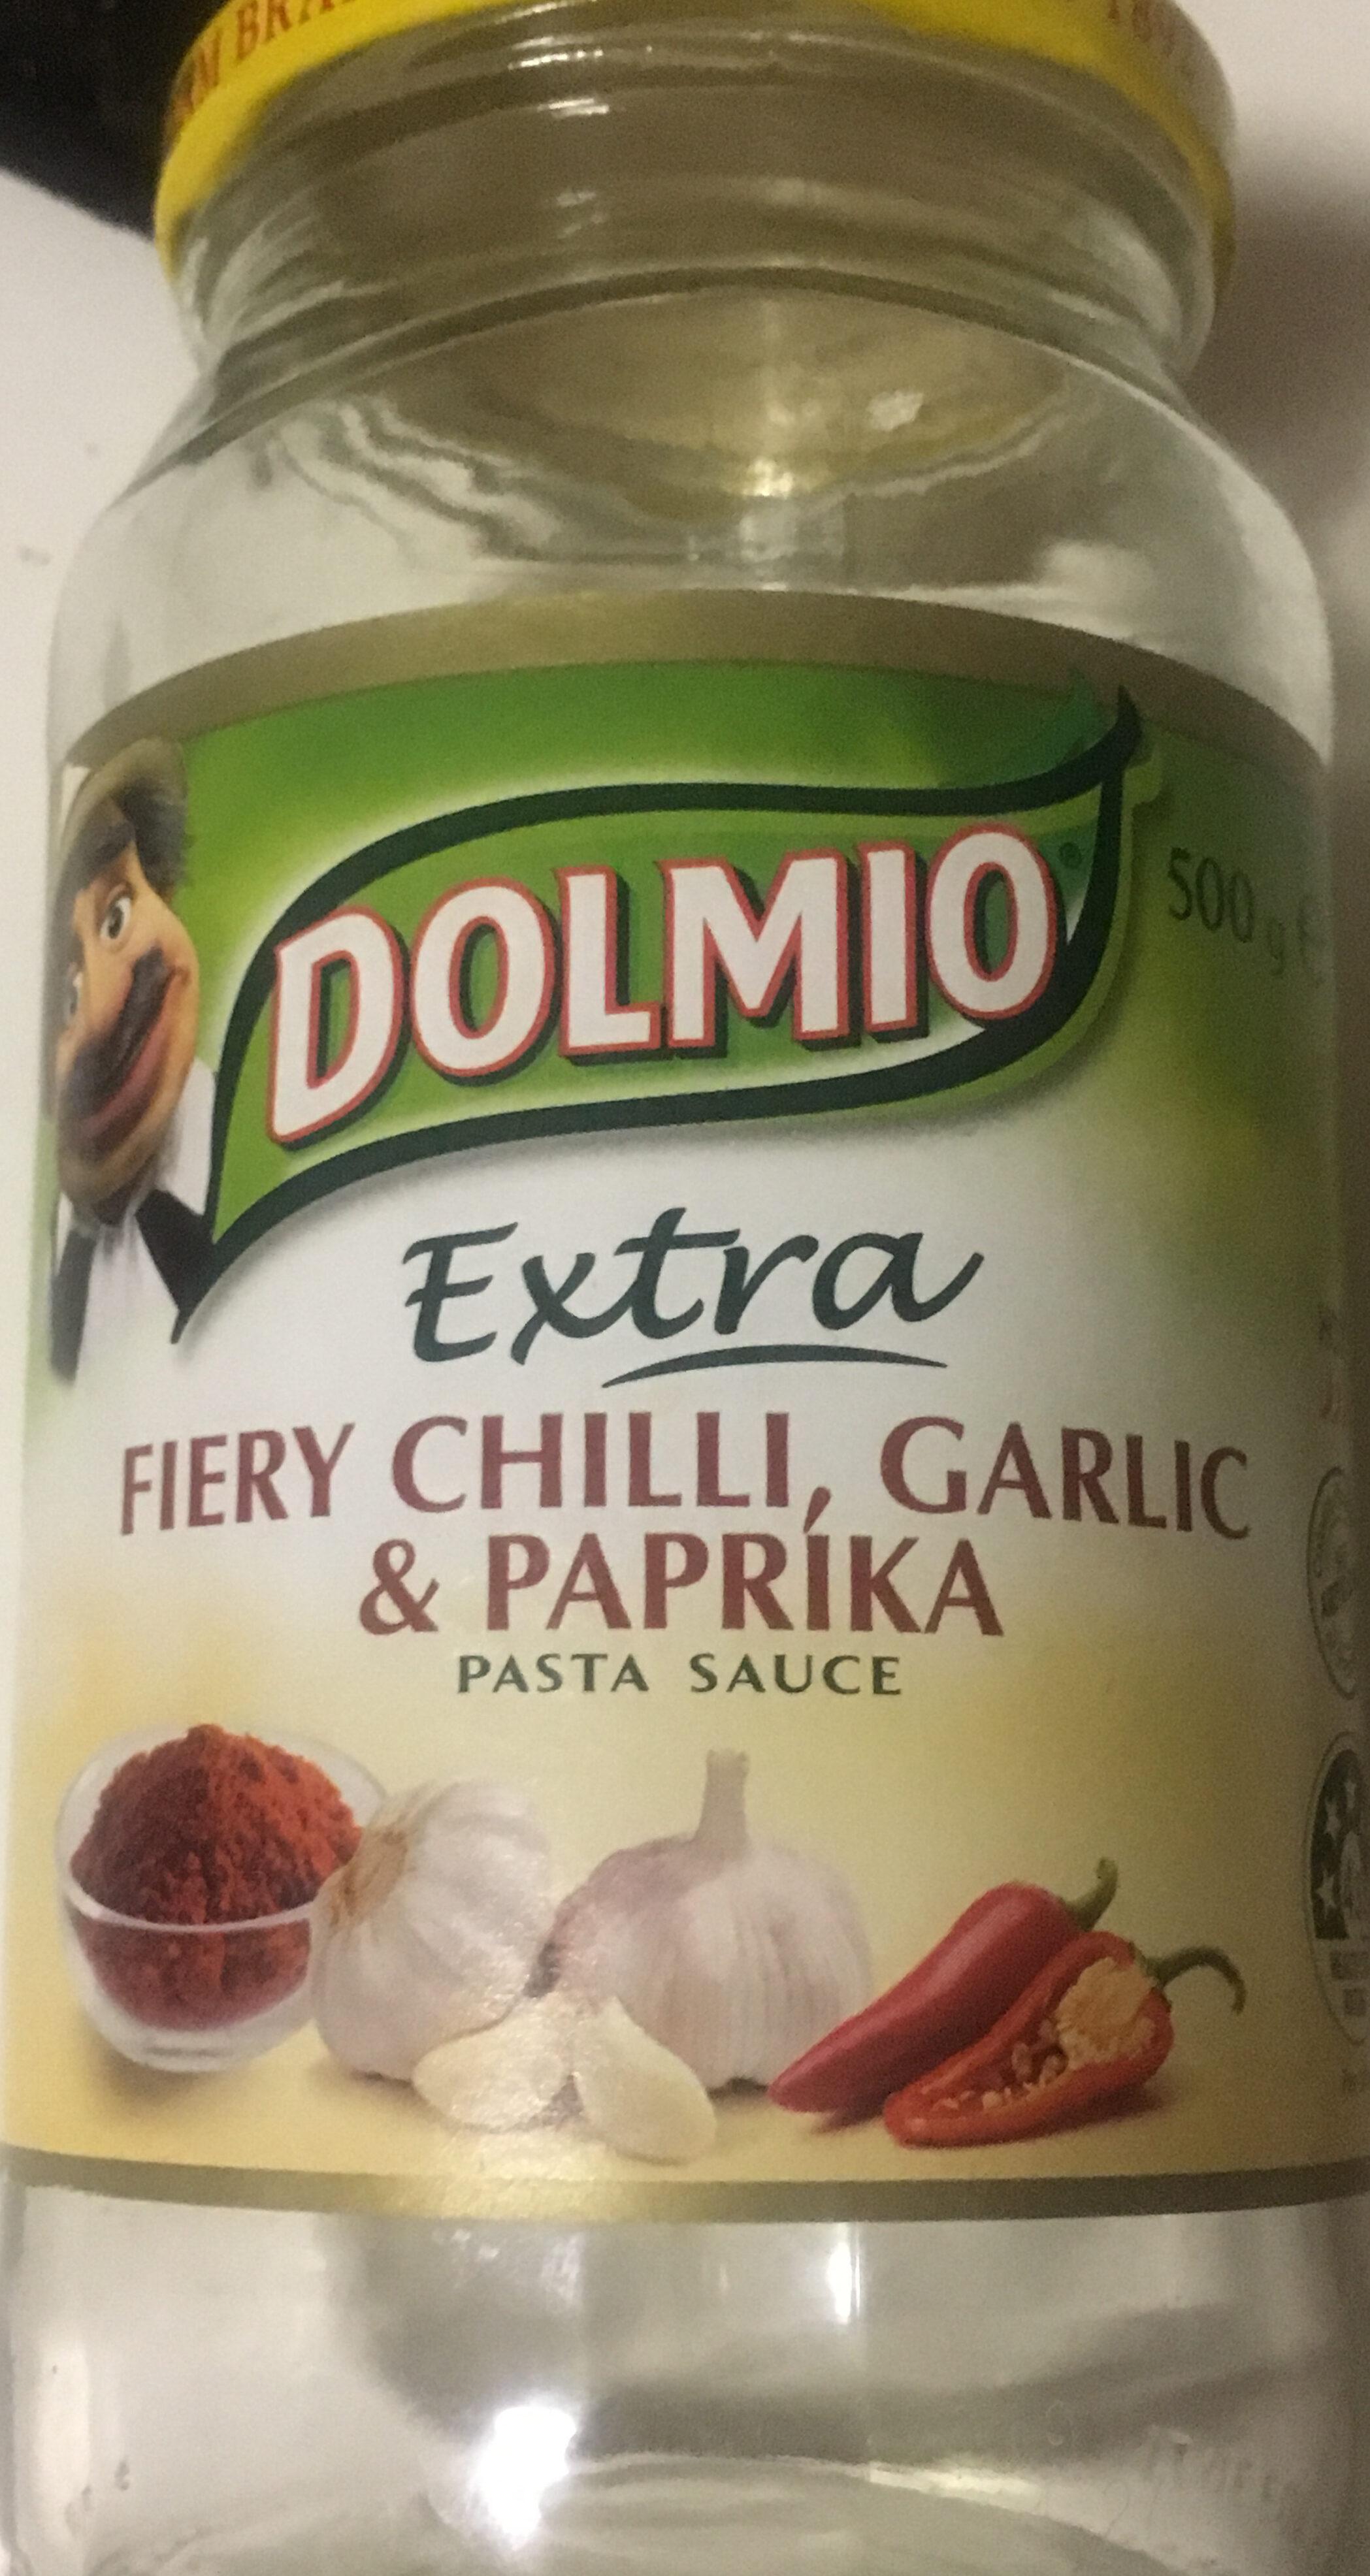 Fiery Chilli Garlic & Paprika Pasta Sauce - Product - en